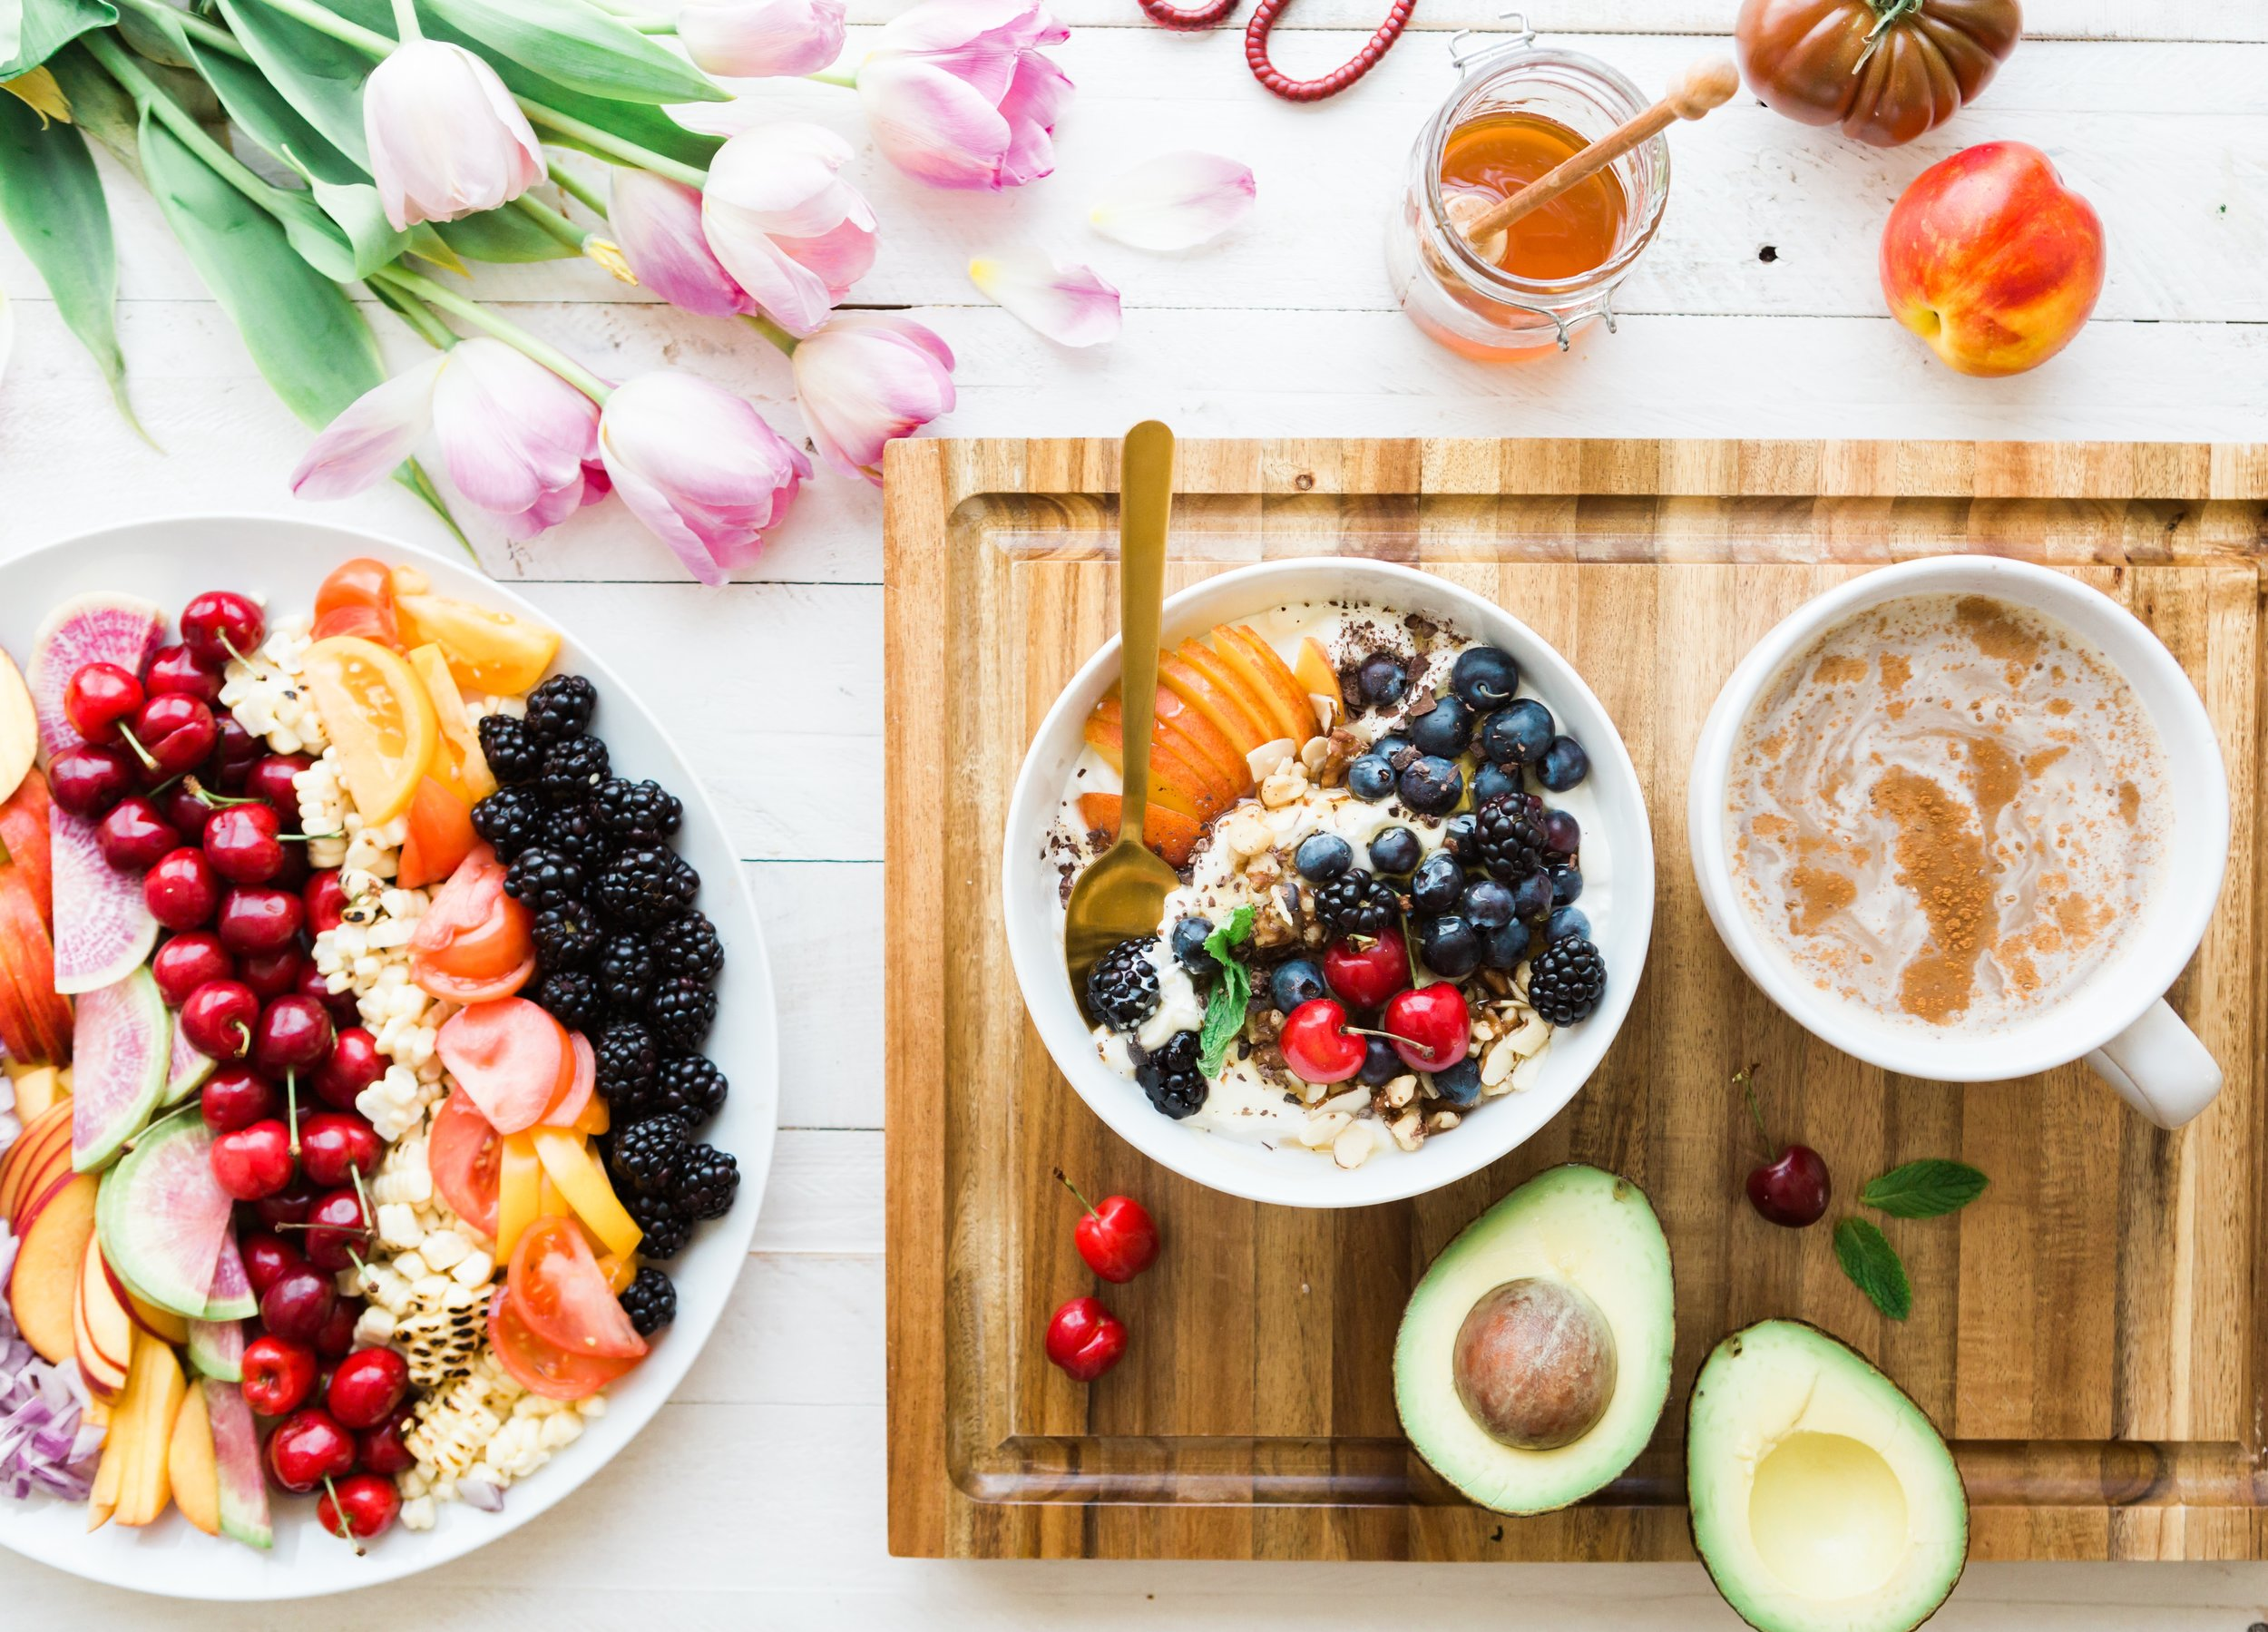 Spring Mindful Health Vegetarian Cleanse Detox